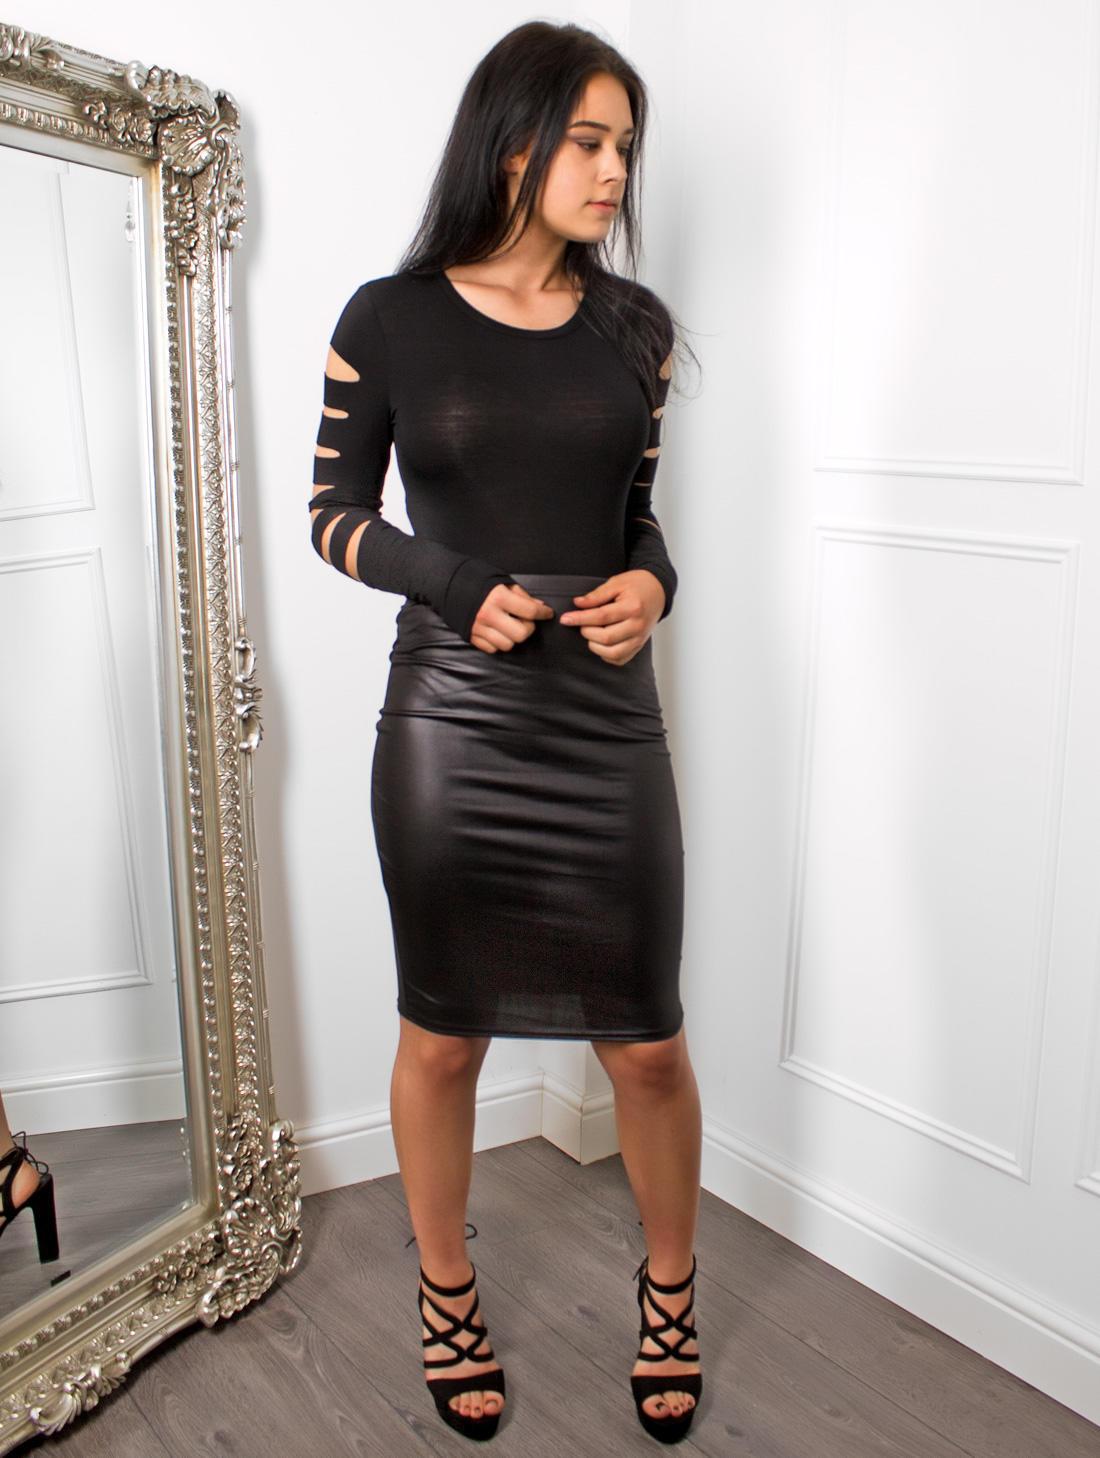 Black Leather Look Midi Skirt | Skirts | ShesLovely.co.uk